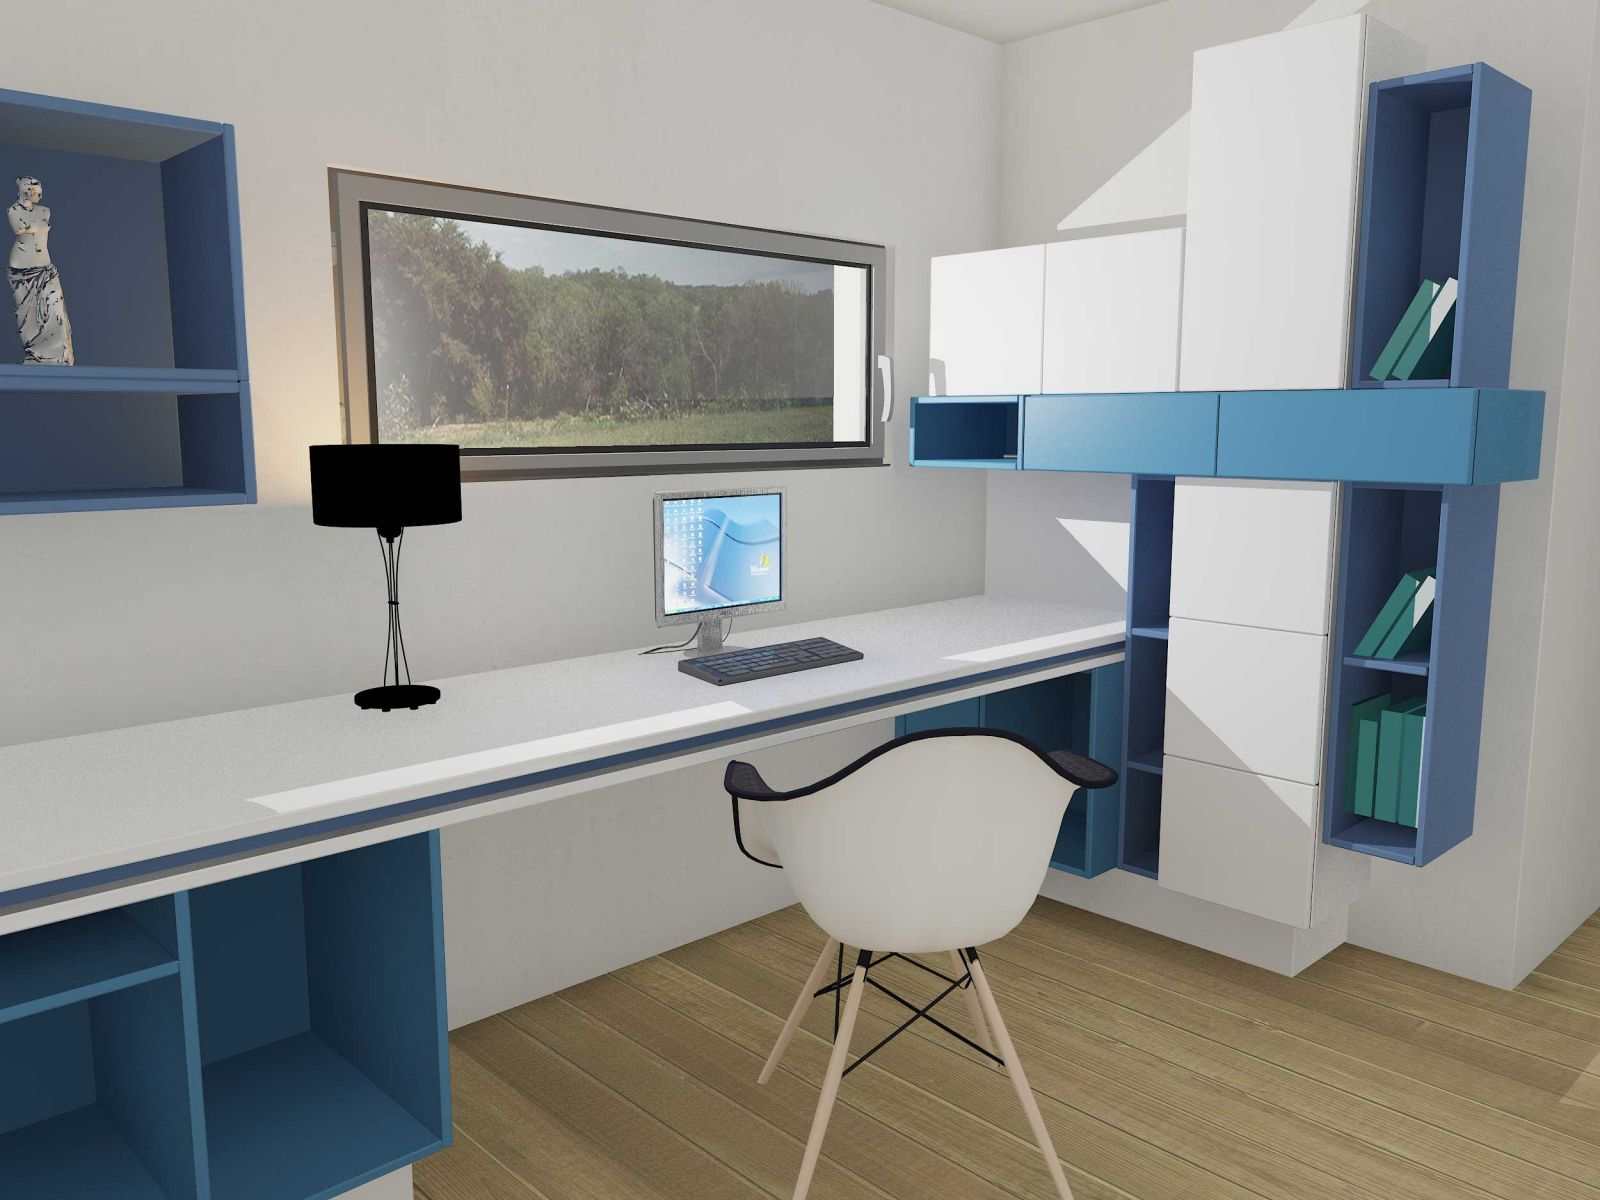 l quipe creativ mobilier s agrandit c t particulier. Black Bedroom Furniture Sets. Home Design Ideas